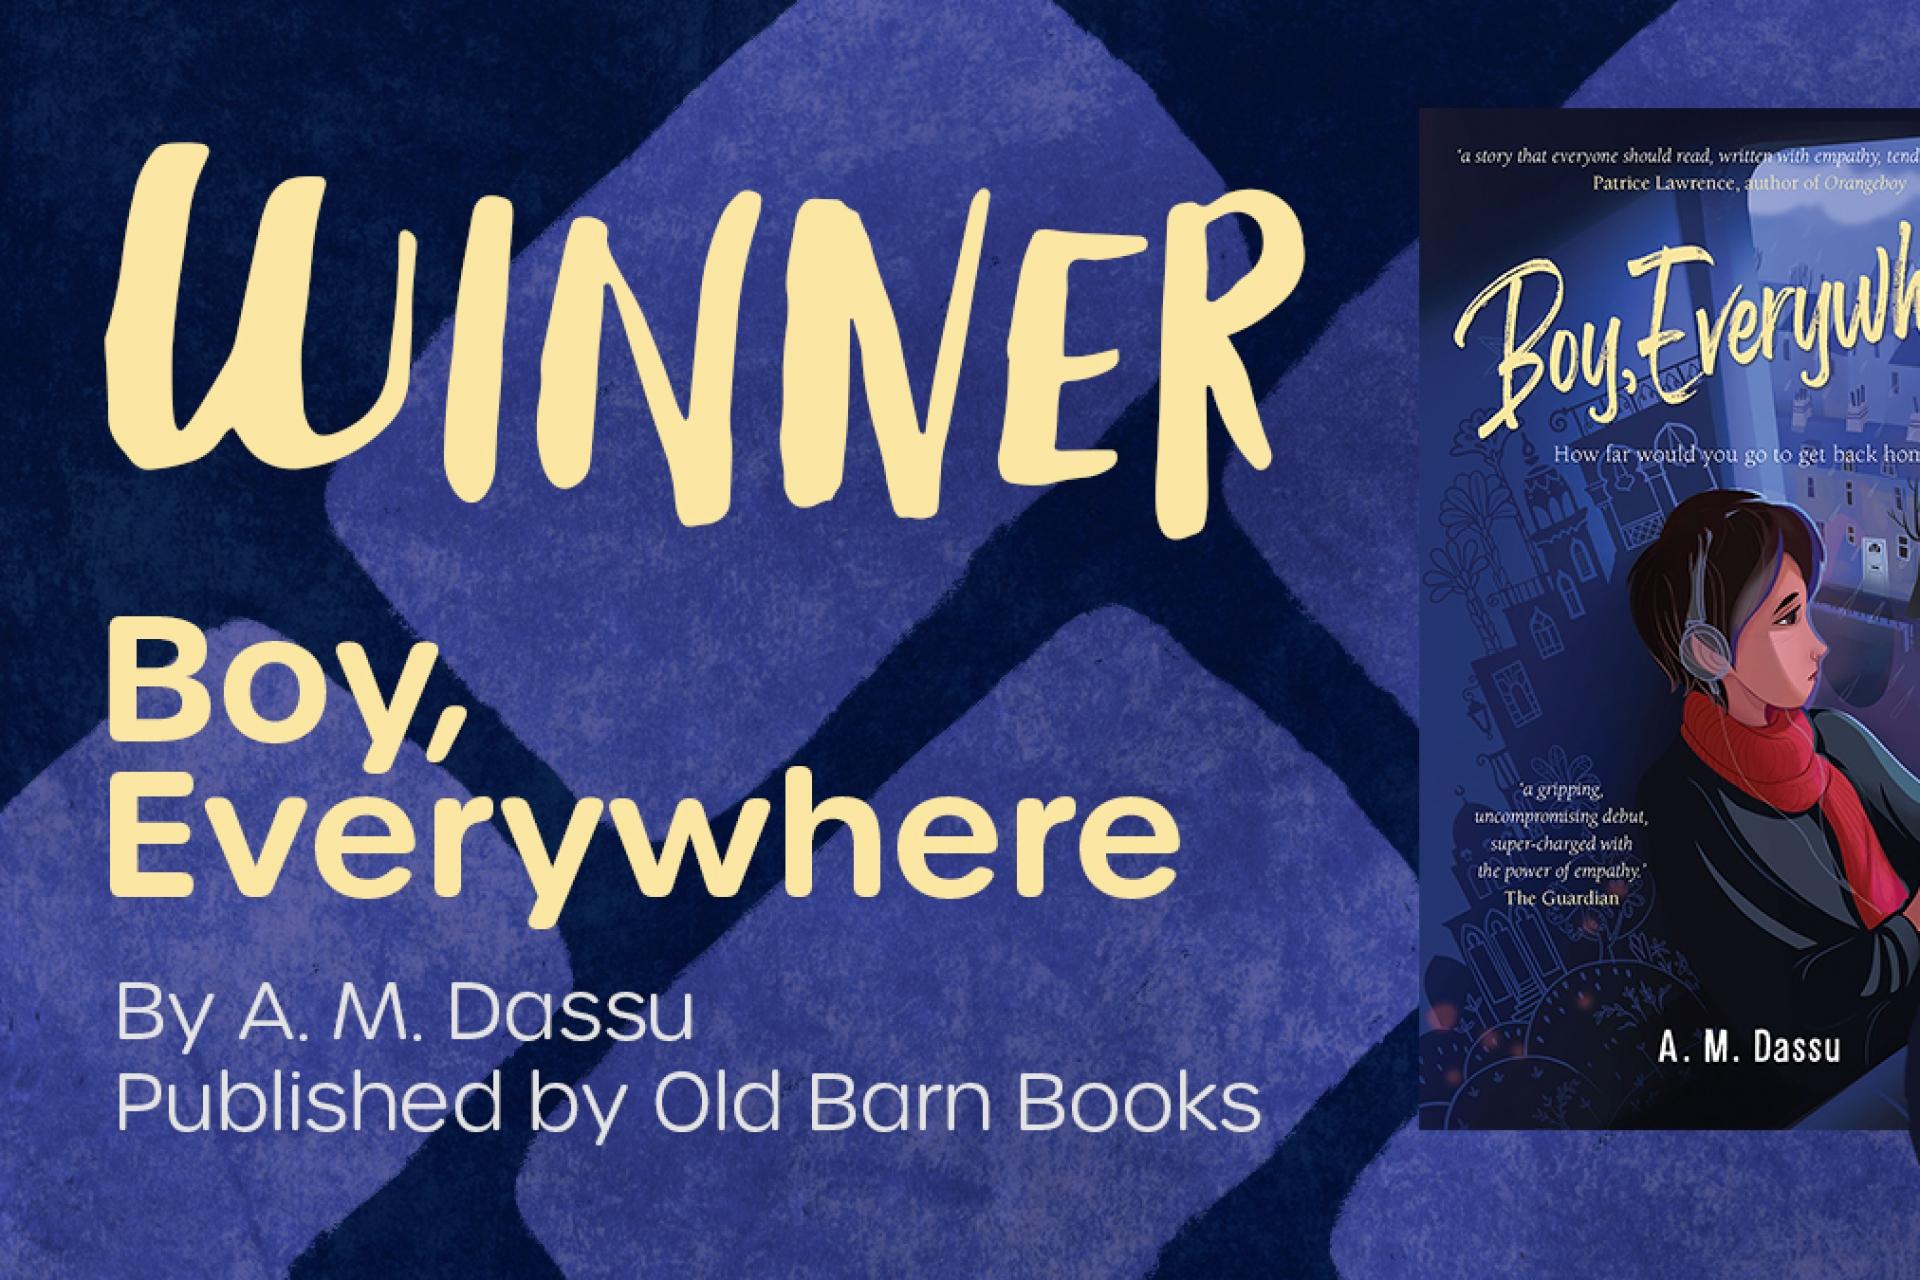 Congratulations to A.M. Dassu, 2021 Little Rebels Award Winner for Boy, Everywhere